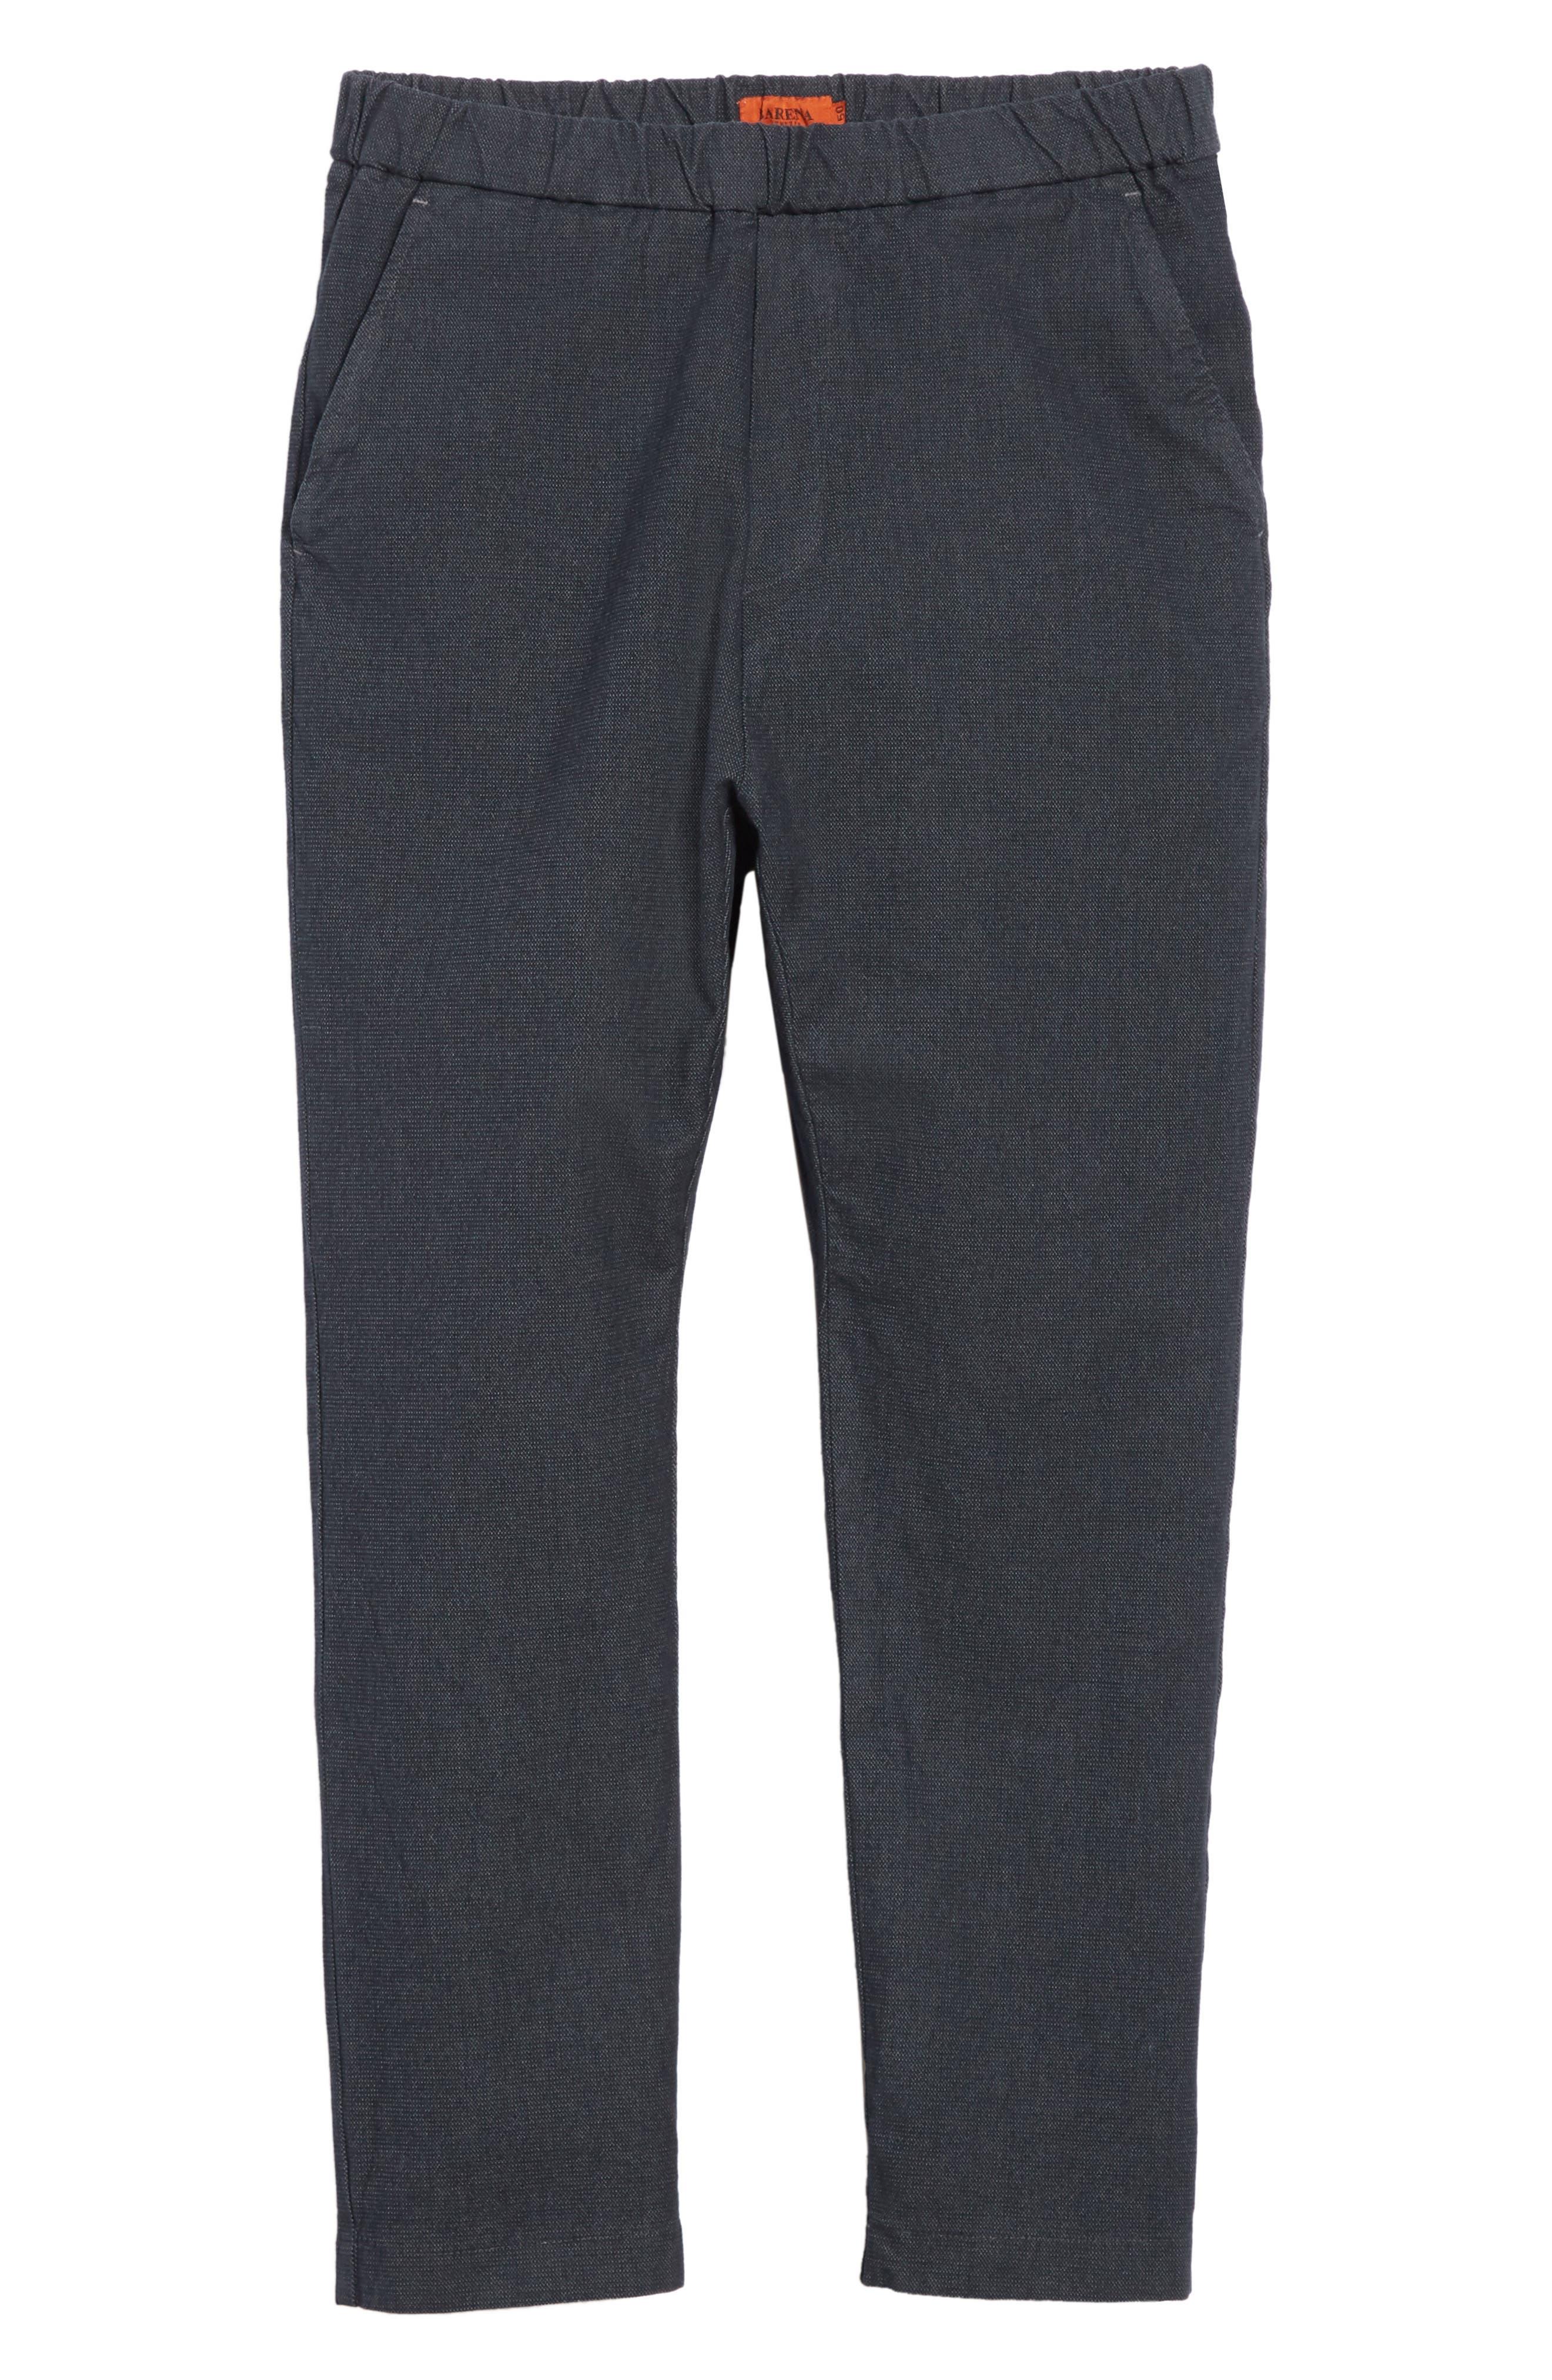 Aregna Ponto Trousers,                             Alternate thumbnail 6, color,                             020